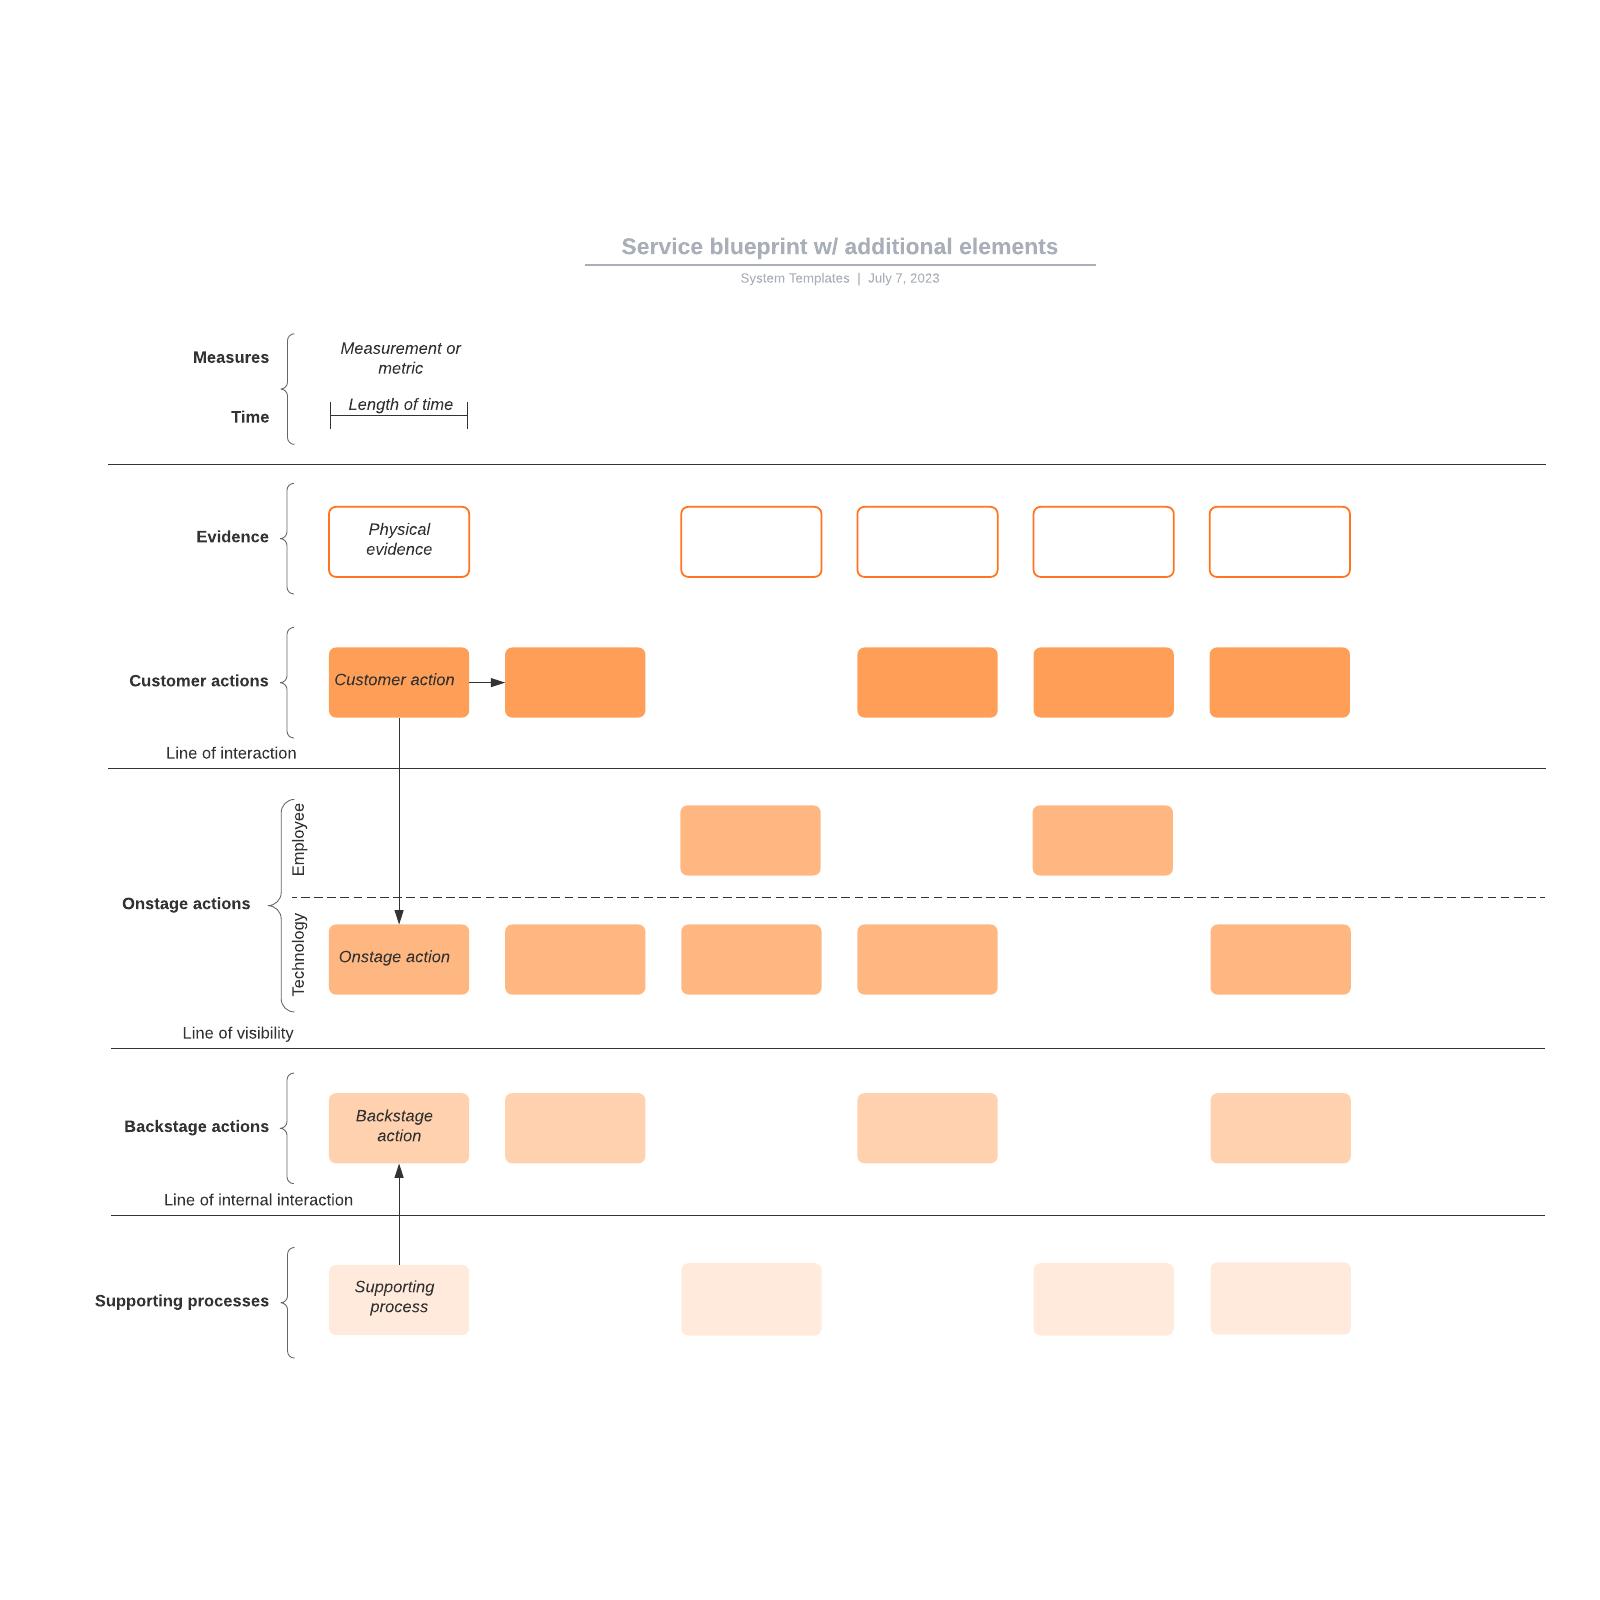 Service blueprint w/ additional elements